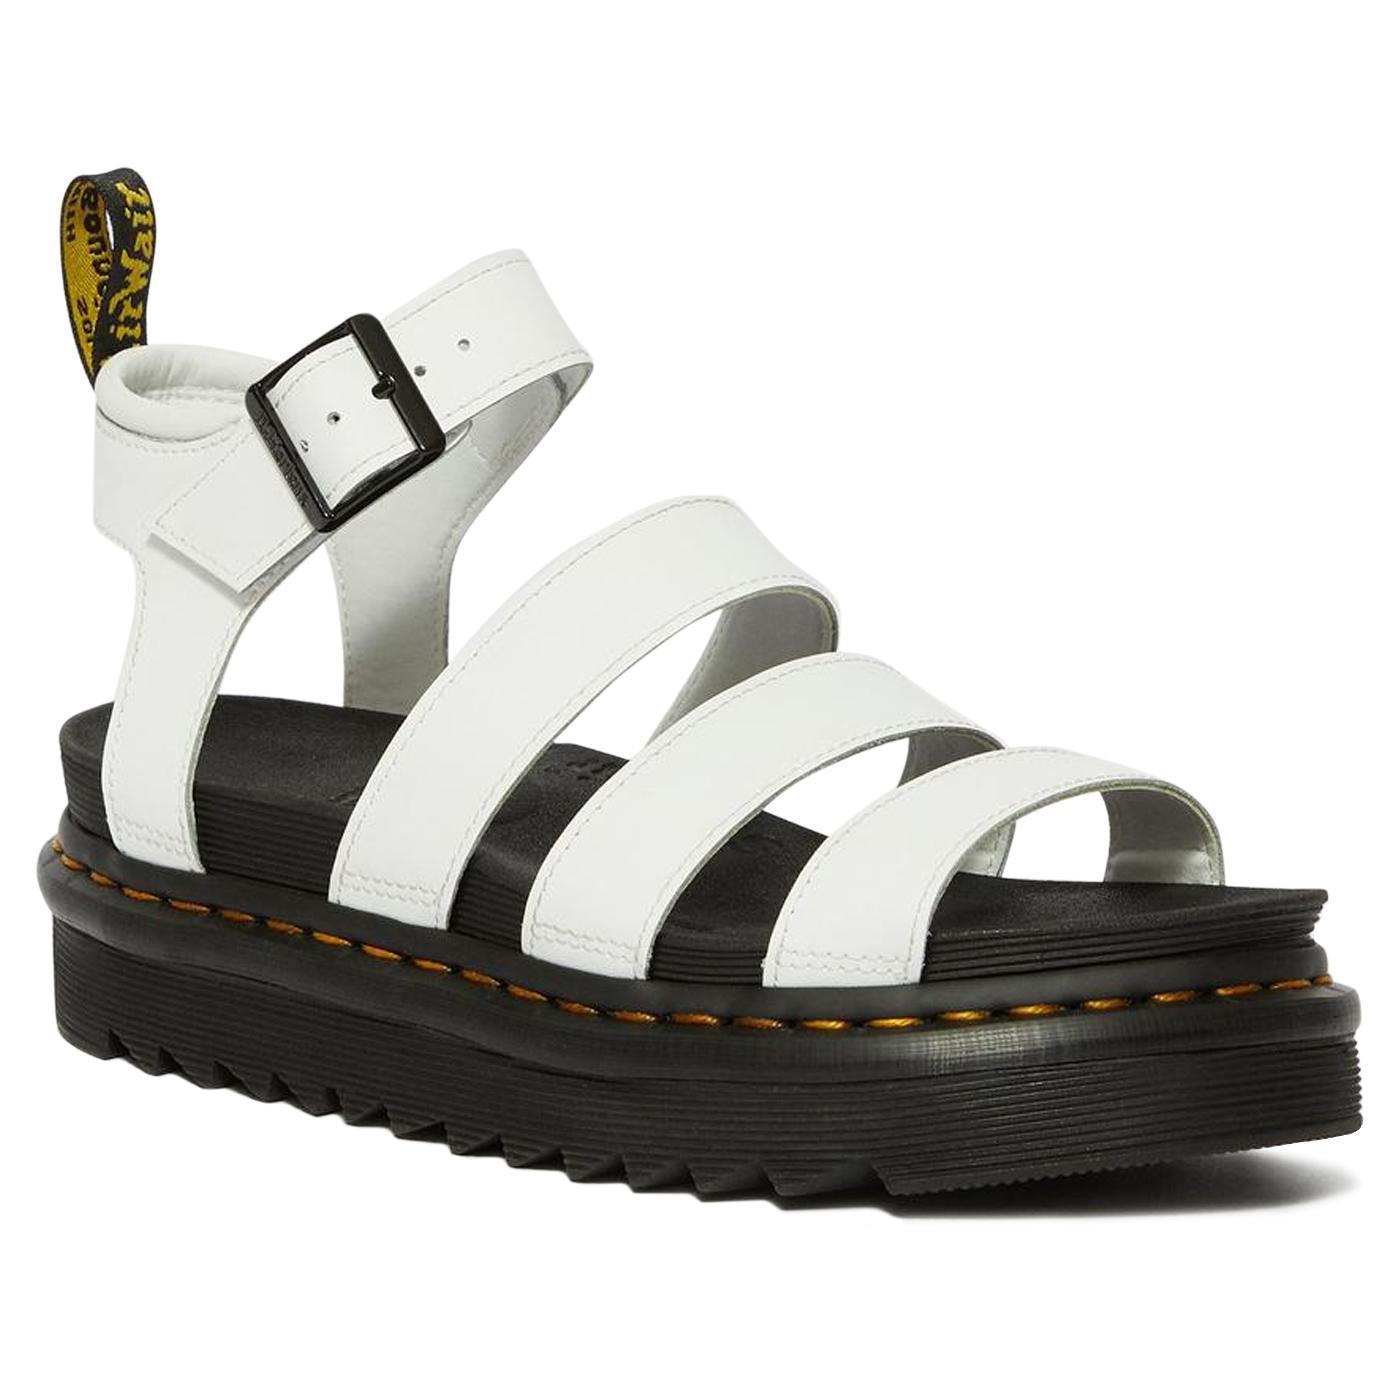 Blaire Hydro DR MARTENS Retro Leather Sandals (W)